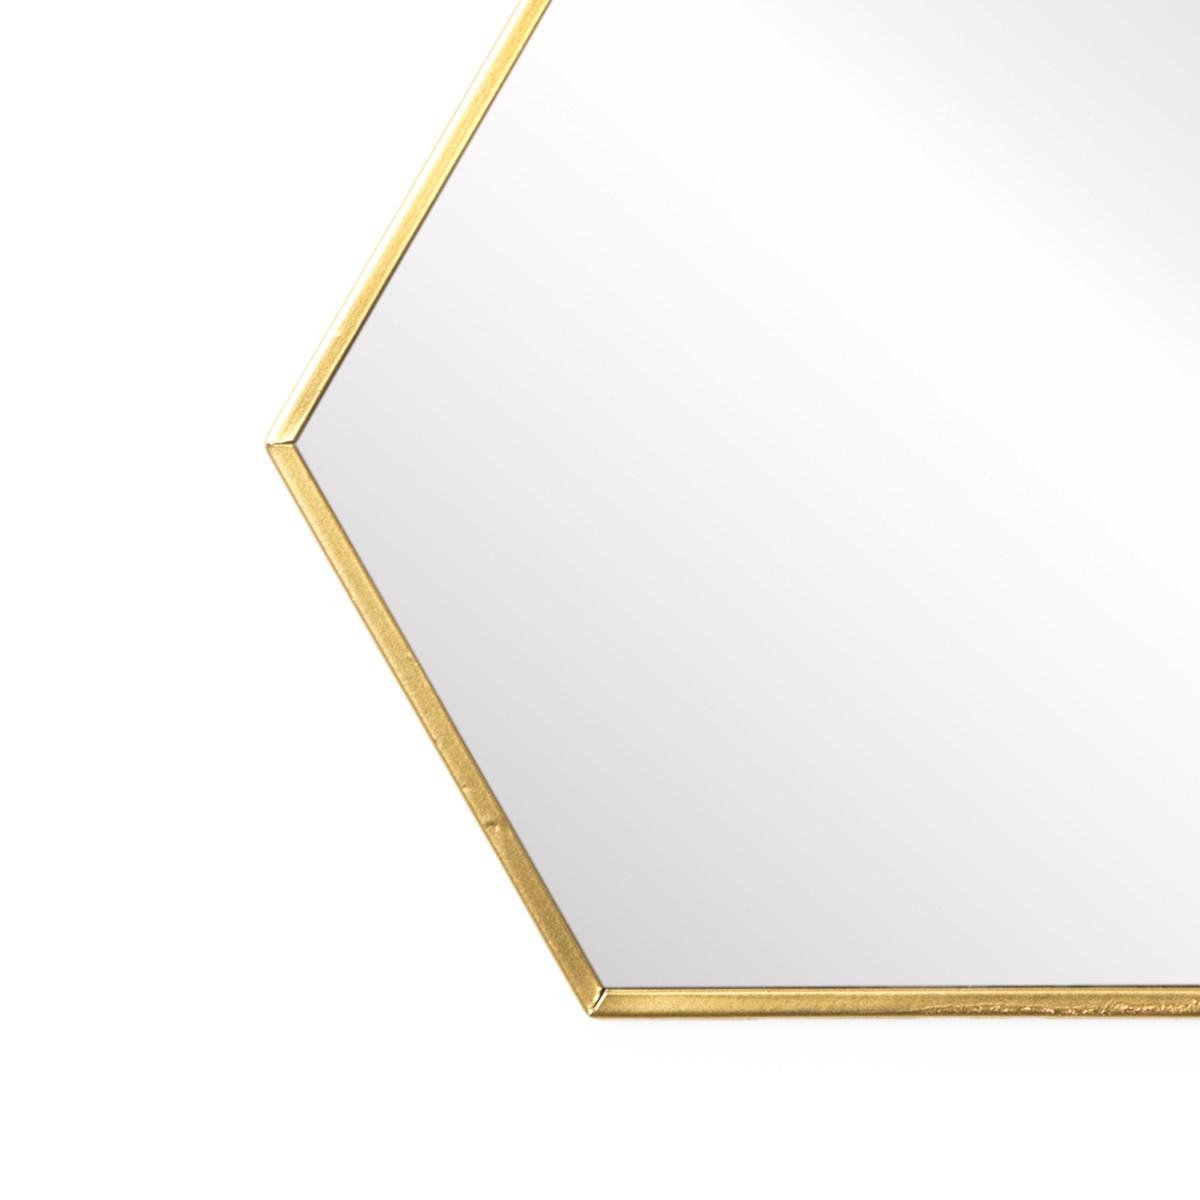 spejo pared de pared decorativo hexagonal Mirror, metálico, estilo étnico & boho chic, nórdico, boni